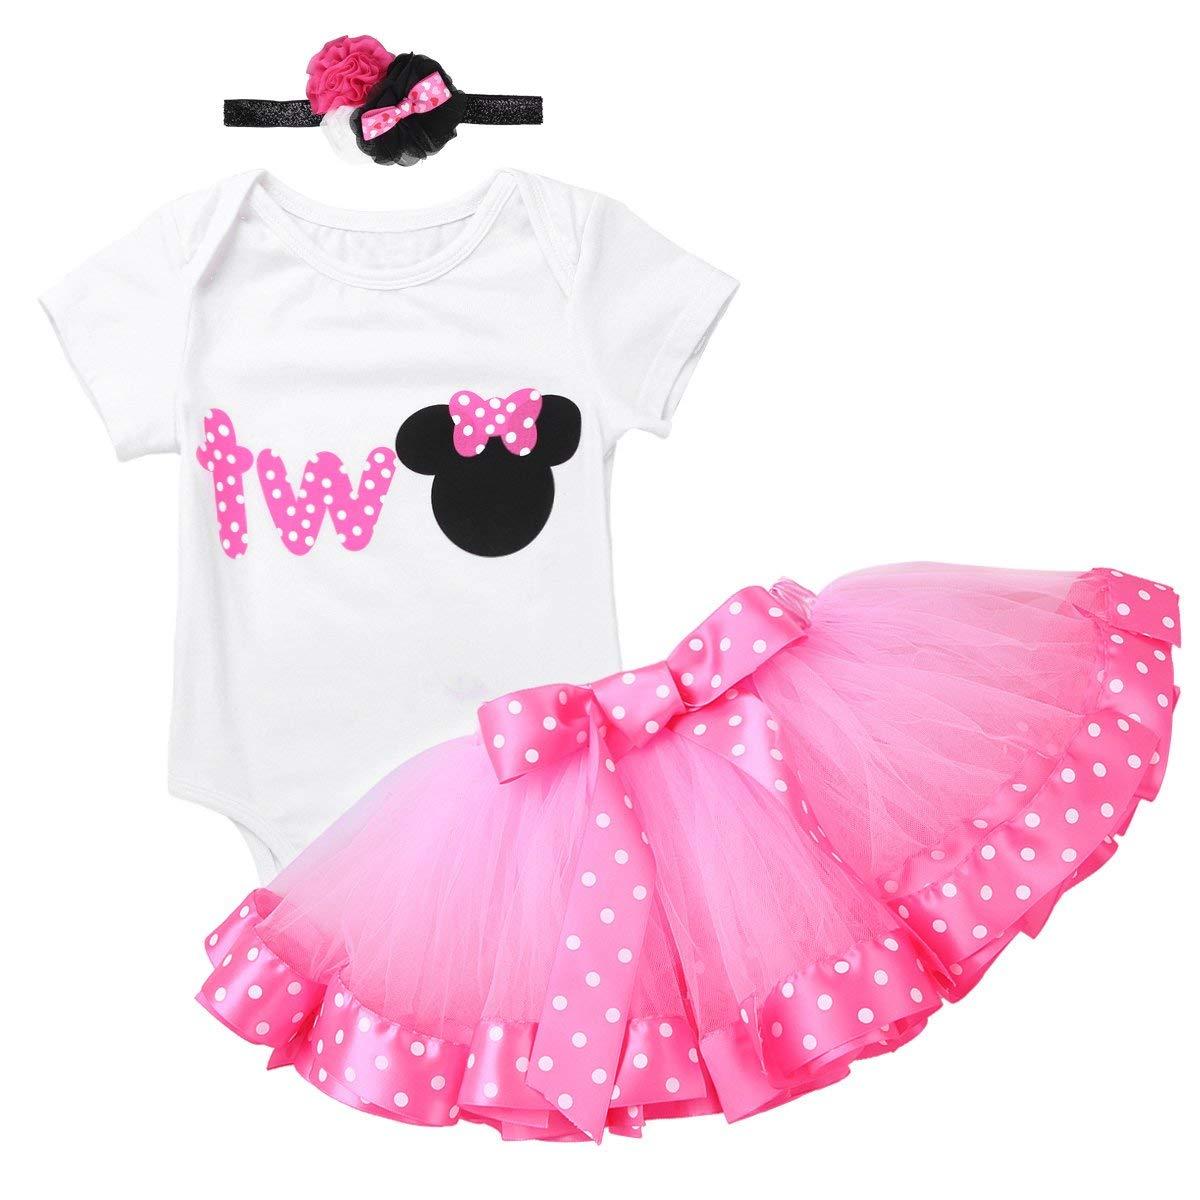 Freebily 3 Pcs Infant Baby Girls 1st Birthday Outfits Princess Cartoon Romper Tutu Skirt Clothes Sets